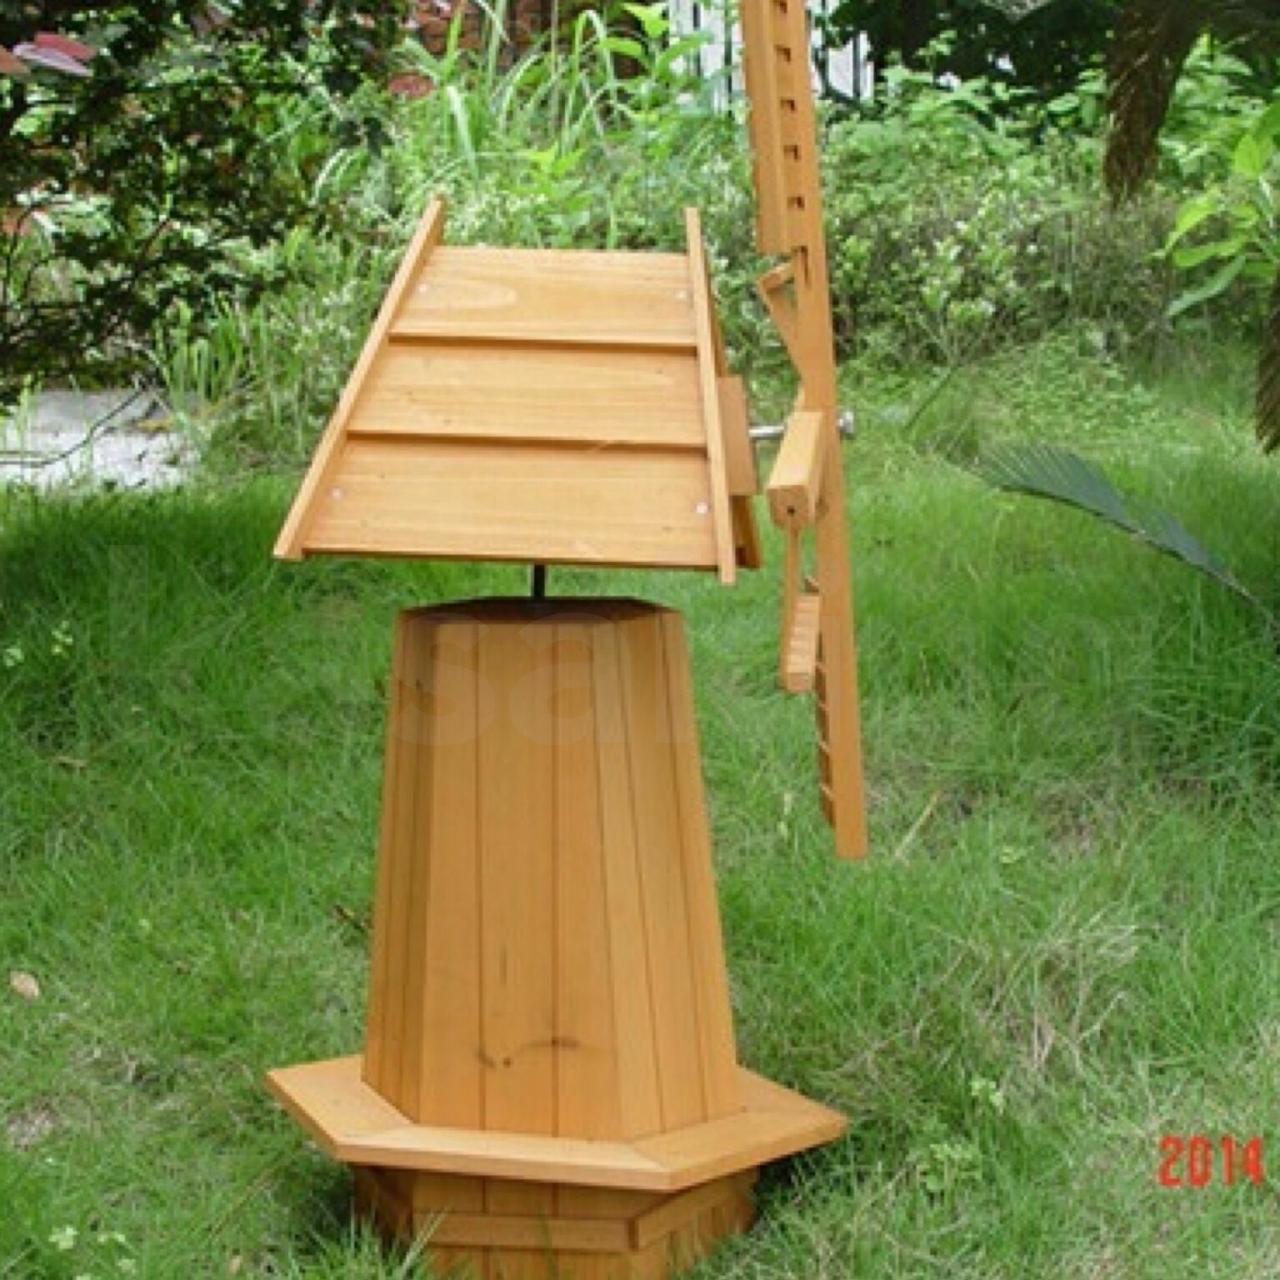 KASA 72 Outdoor Garden Windmill Wooden Decor Lawn Ornament ...